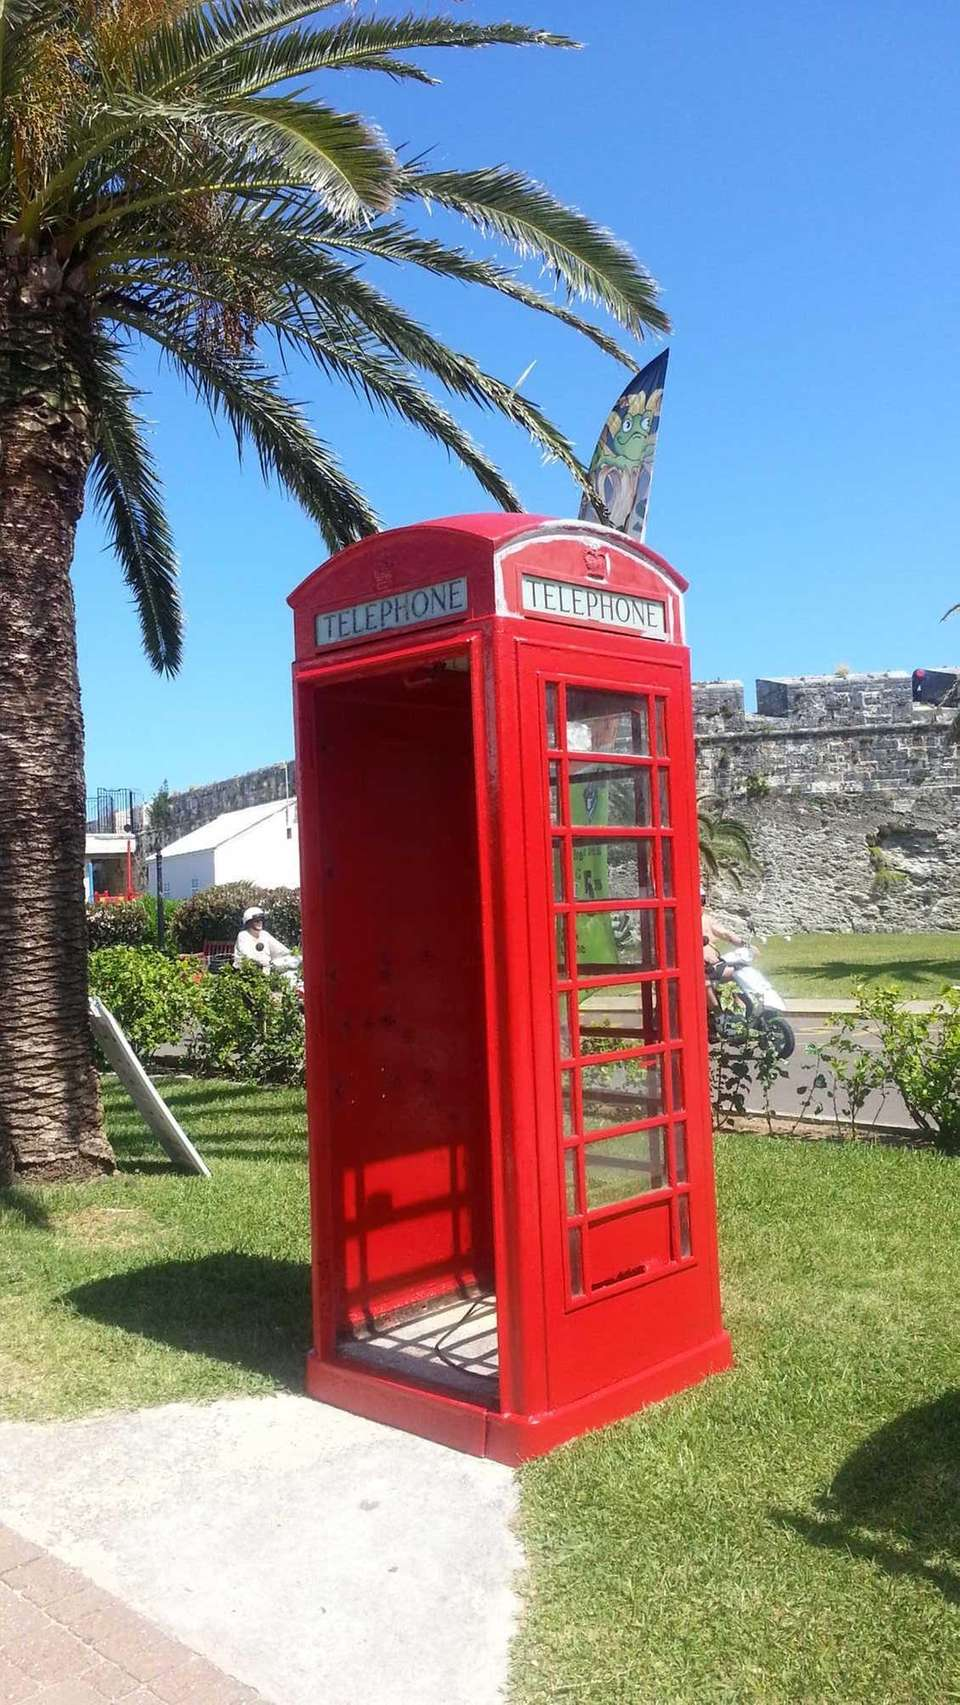 Bermuda phone booth